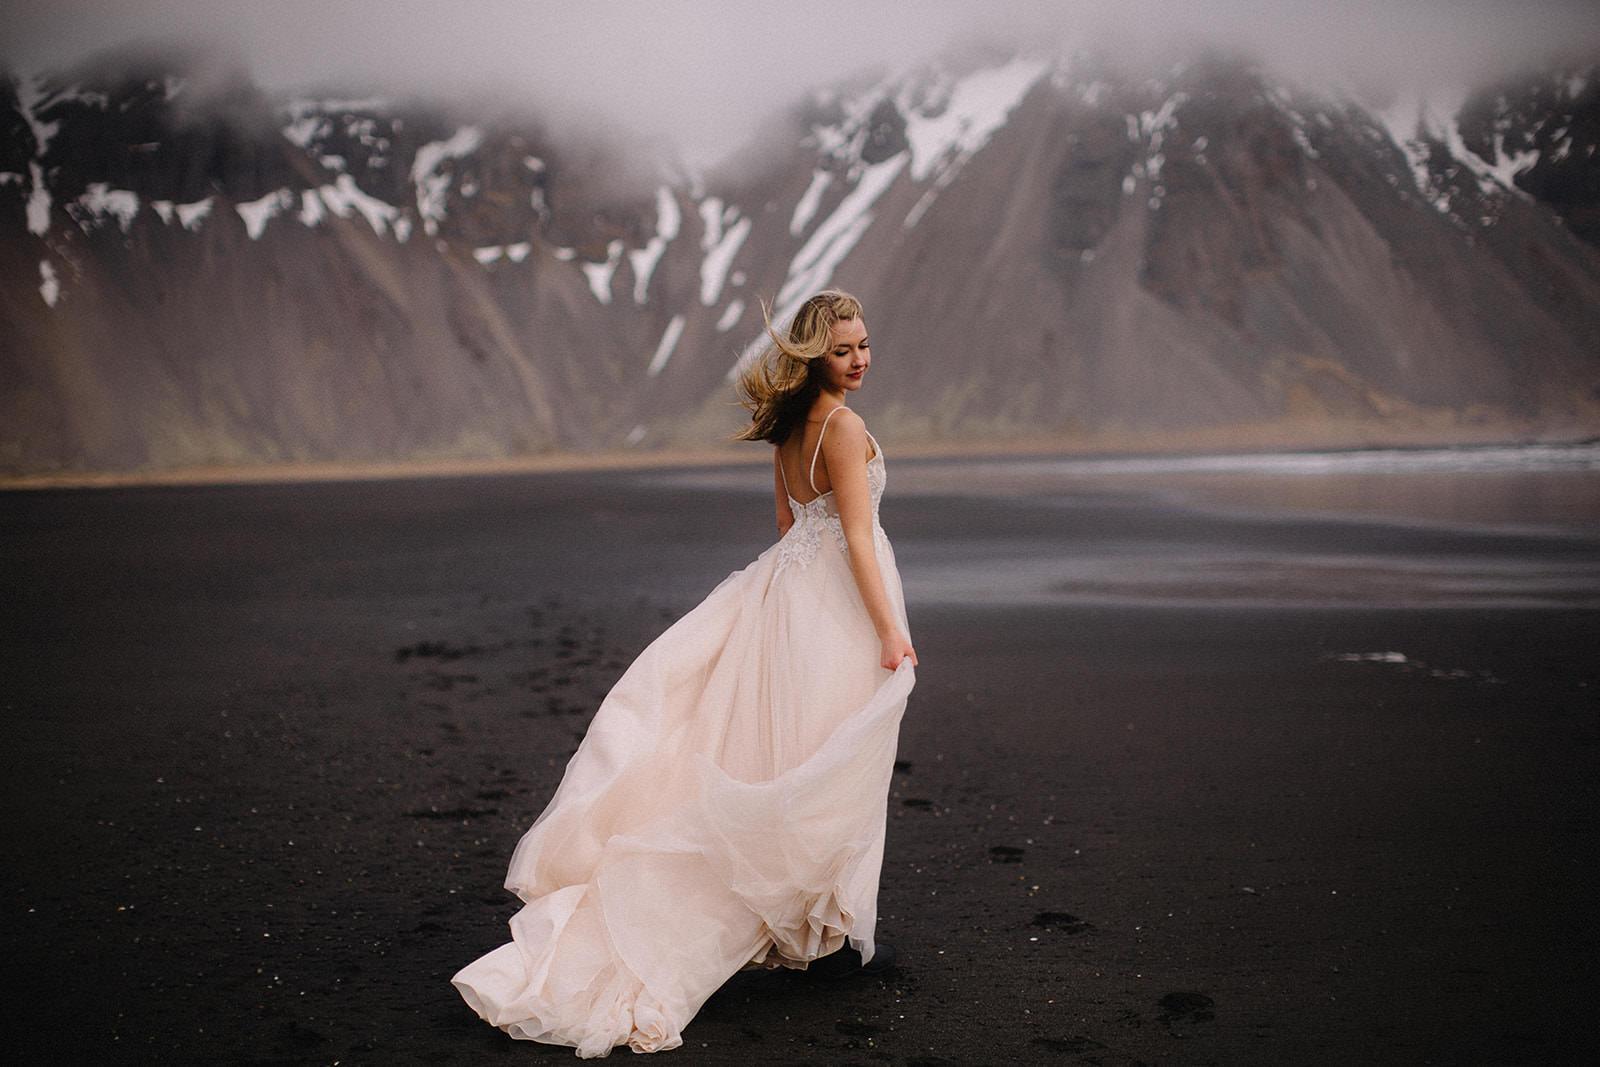 Icelandic Iceland Elopement Wedding Elope Photographer Eloping Reykjavík Vik Black Sand Beach Jökulsárlón Skogafoss Waterfall Vestrahorn Mountain Liz Osban Photography Destination 43.jpg